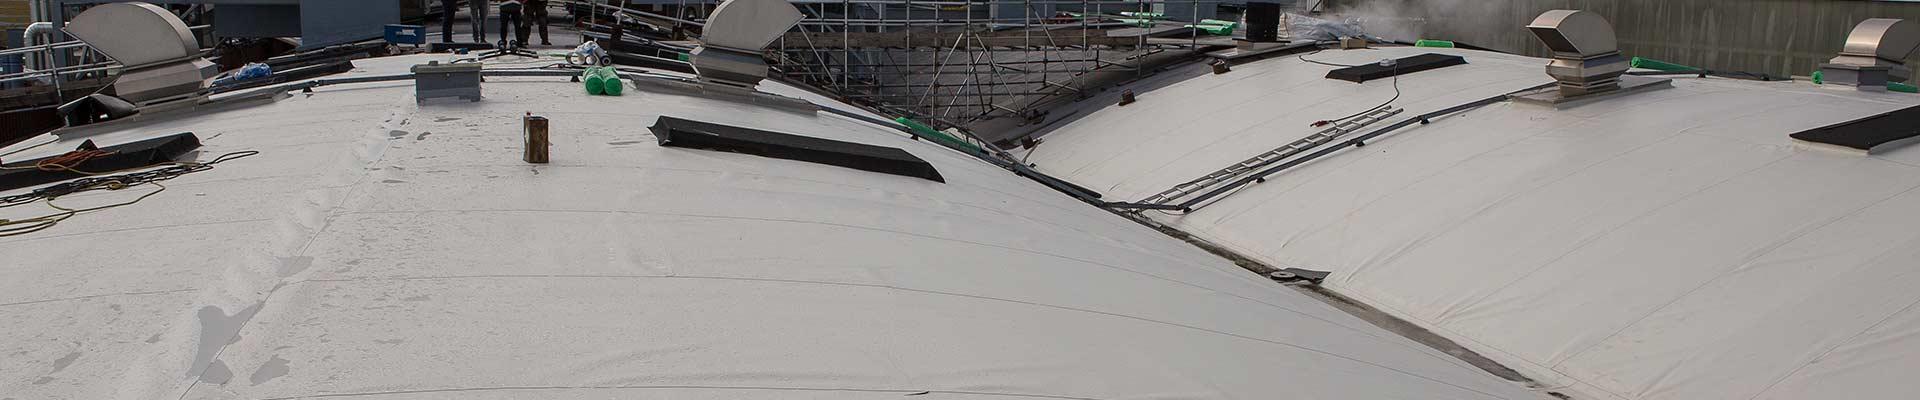 Flagon TPO gebogen dak